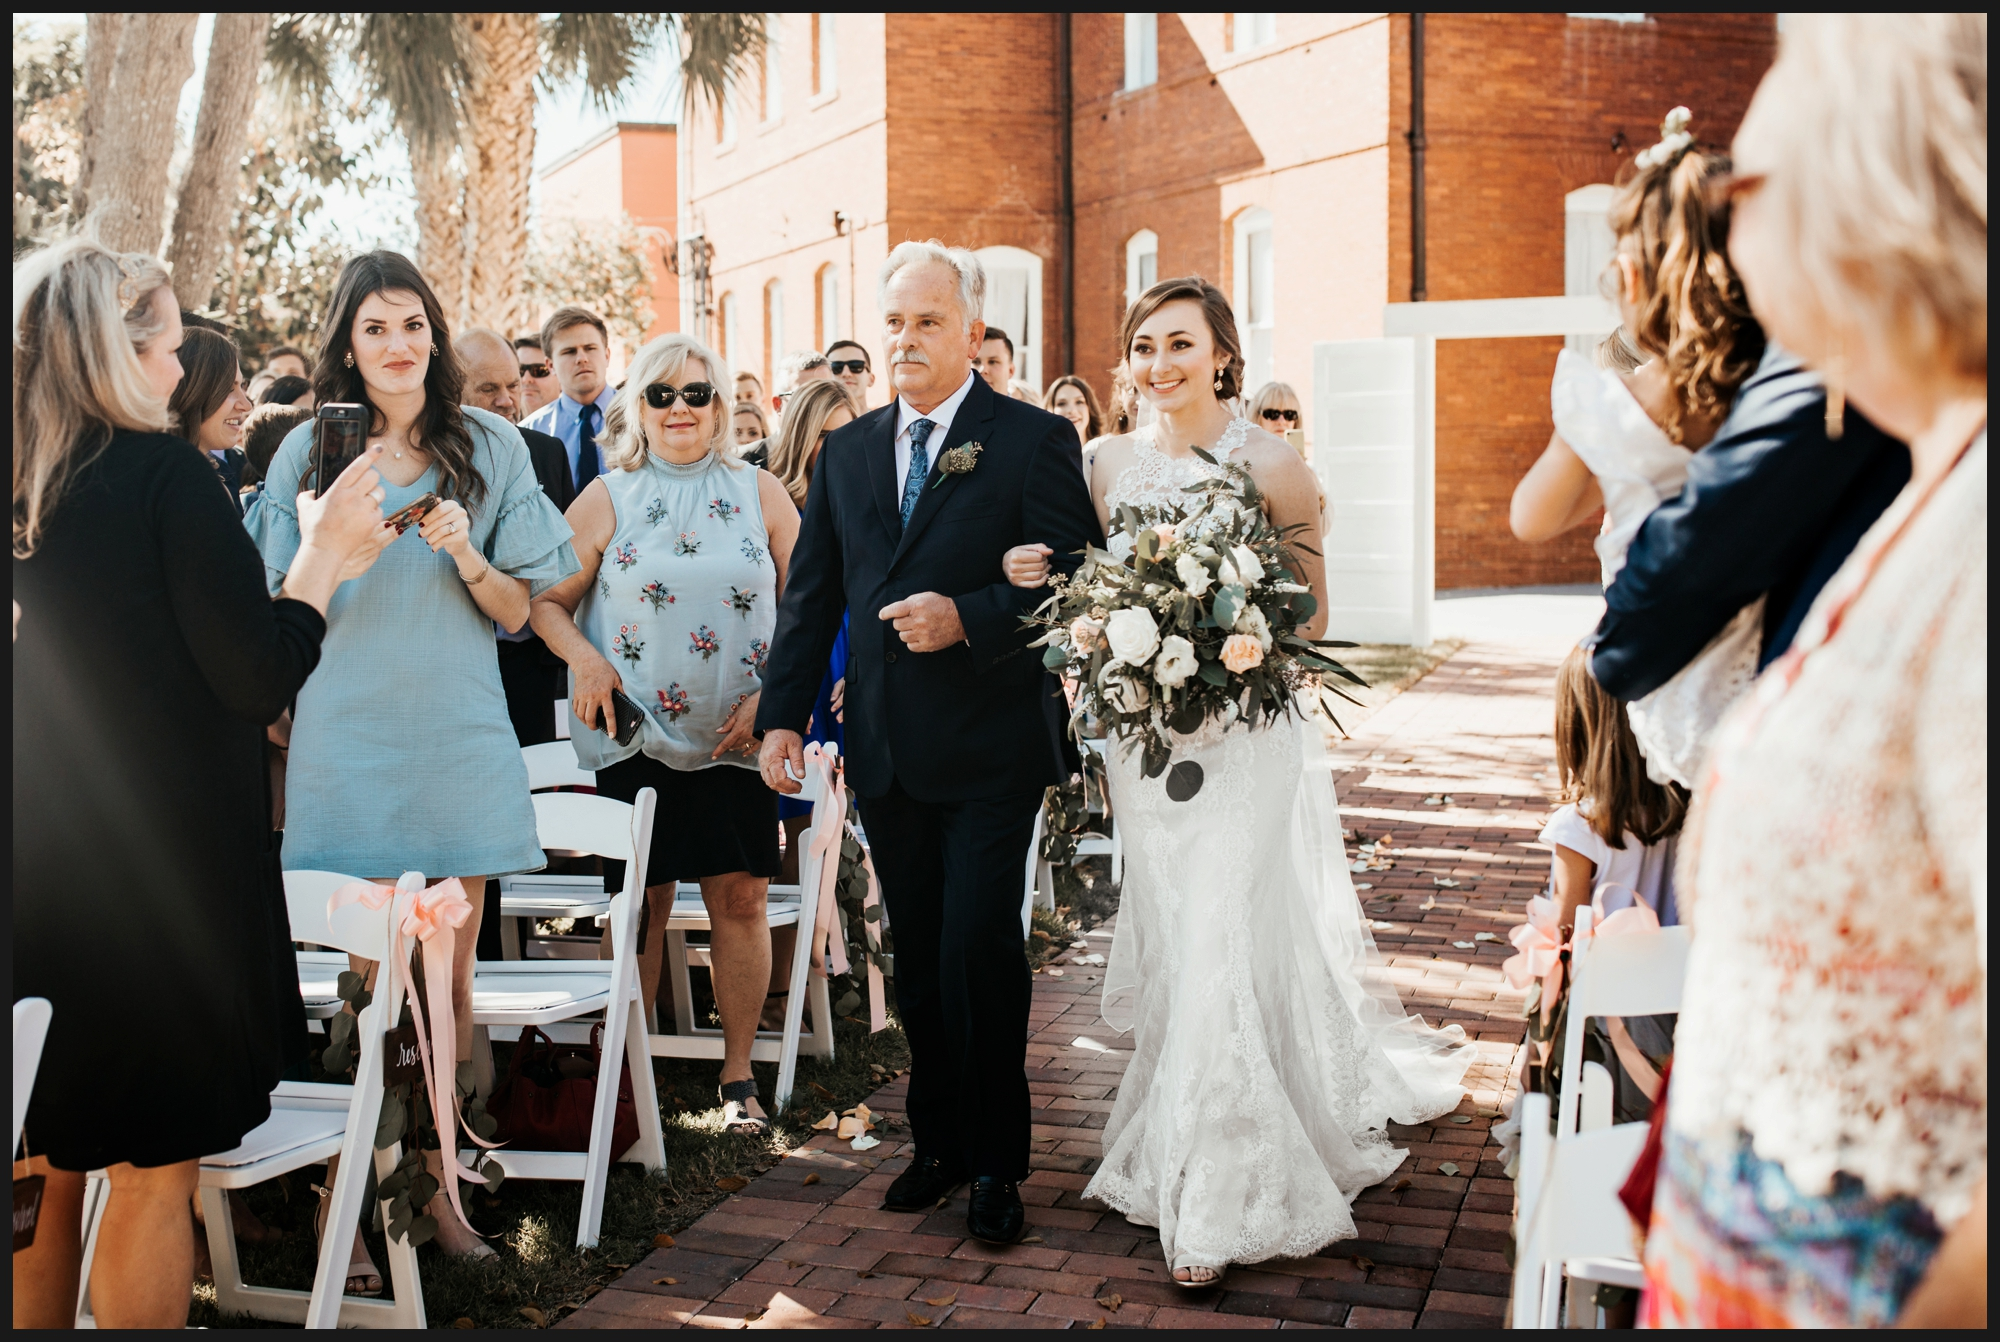 Orlando-Wedding-Photographer-destination-wedding-photographer-florida-wedding-photographer-bohemian-wedding-photographer_1745.jpg